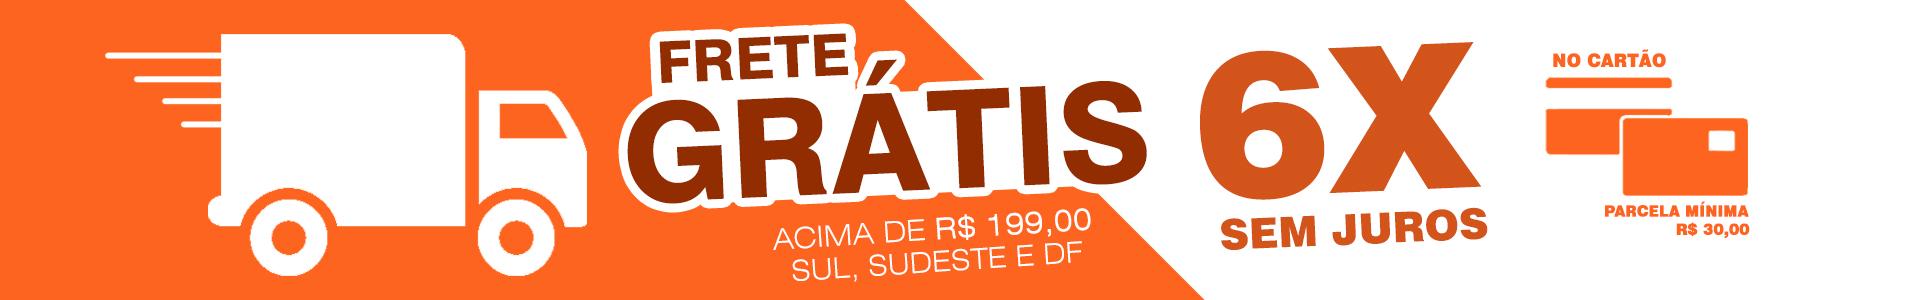 Banner Home Frete Grátis